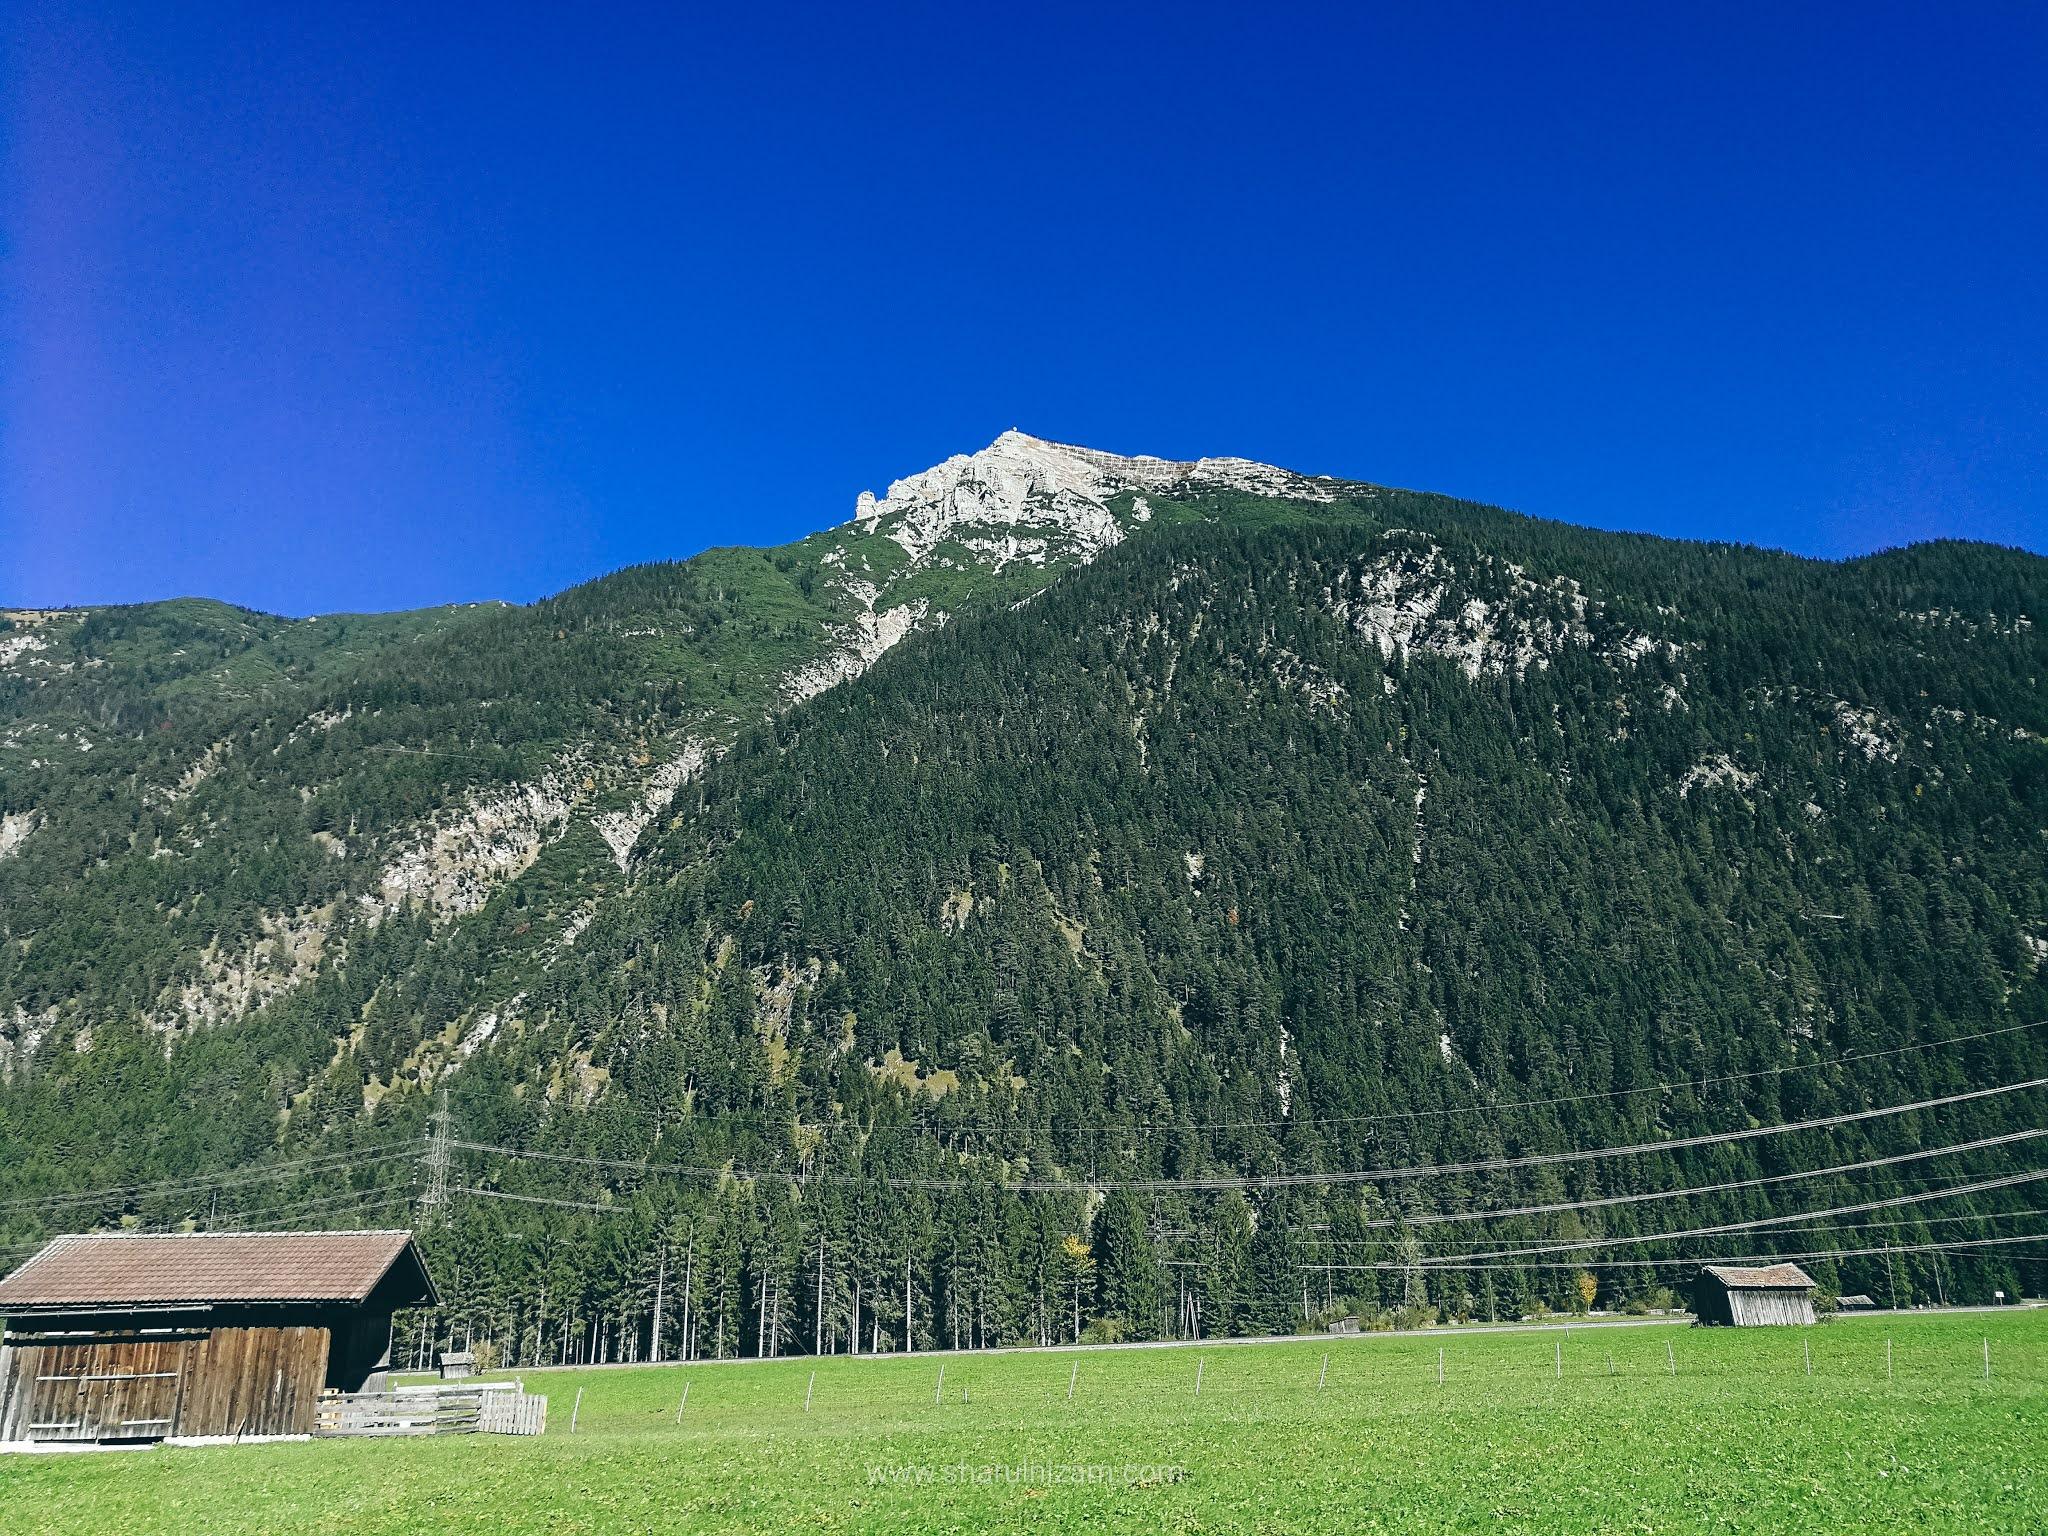 Mengutip Daun Maple Di Eibsee Bersaksikan Gunung Zugspitze